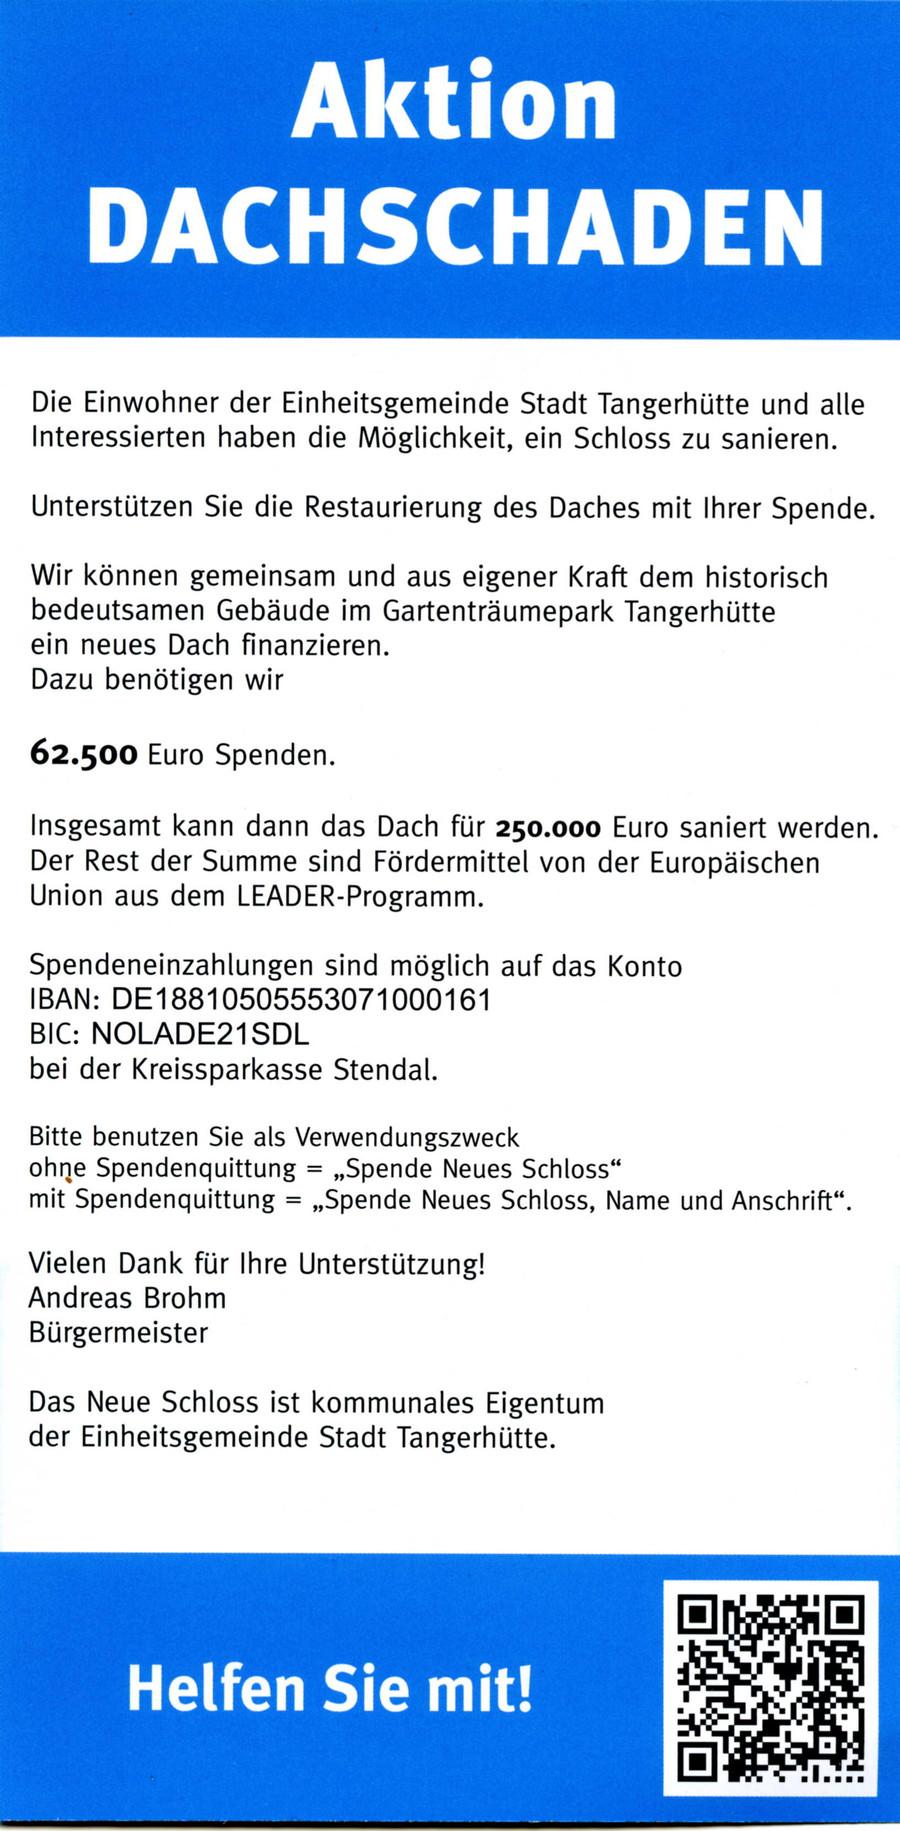 Dachsch_b